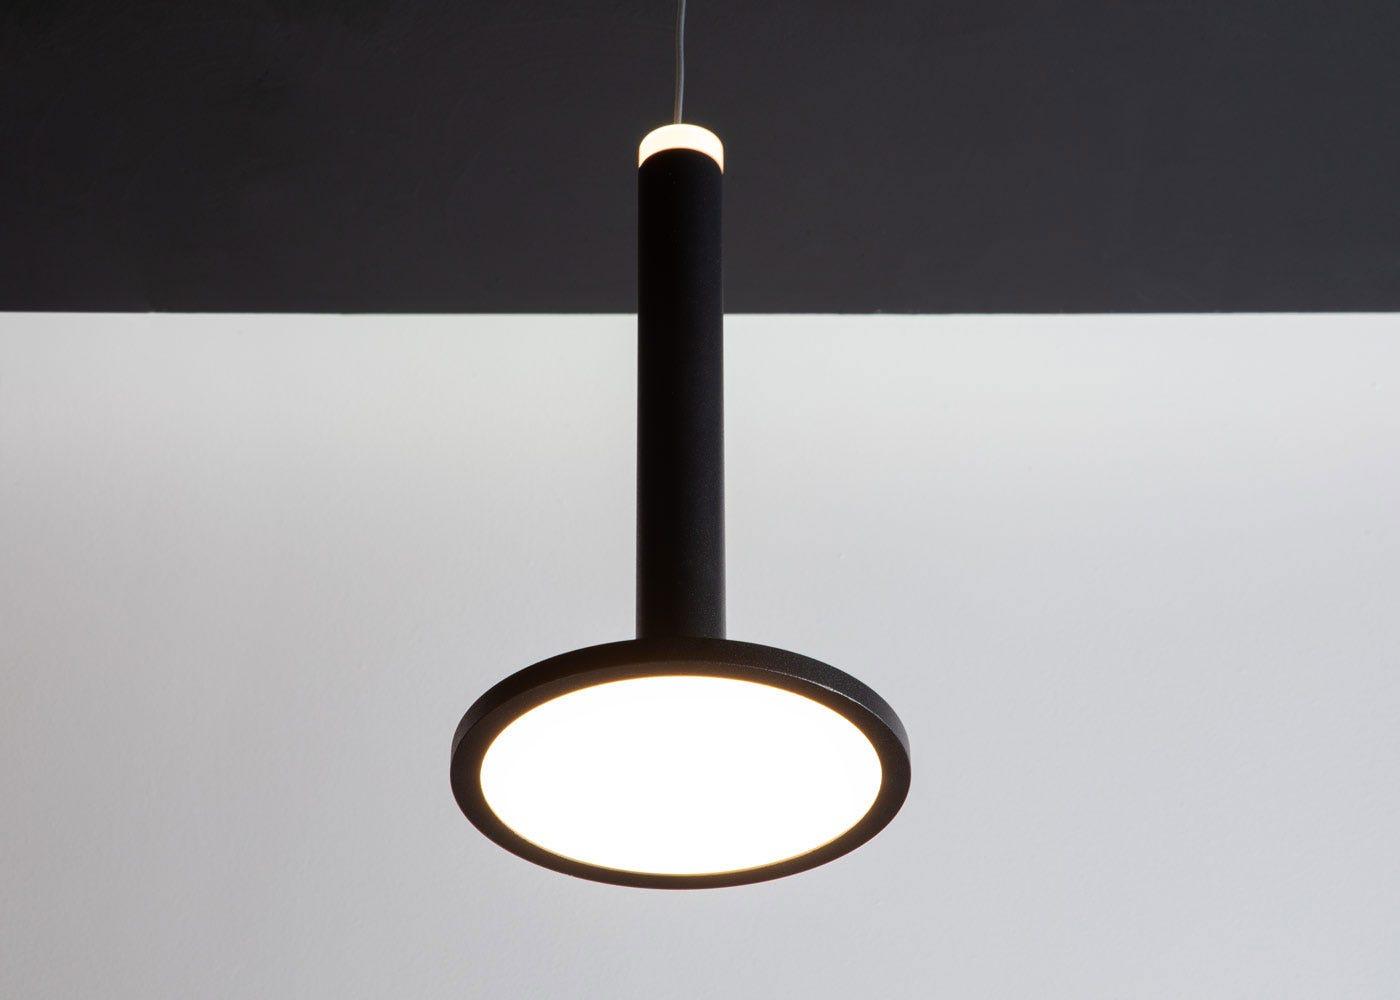 Disc LED light source.